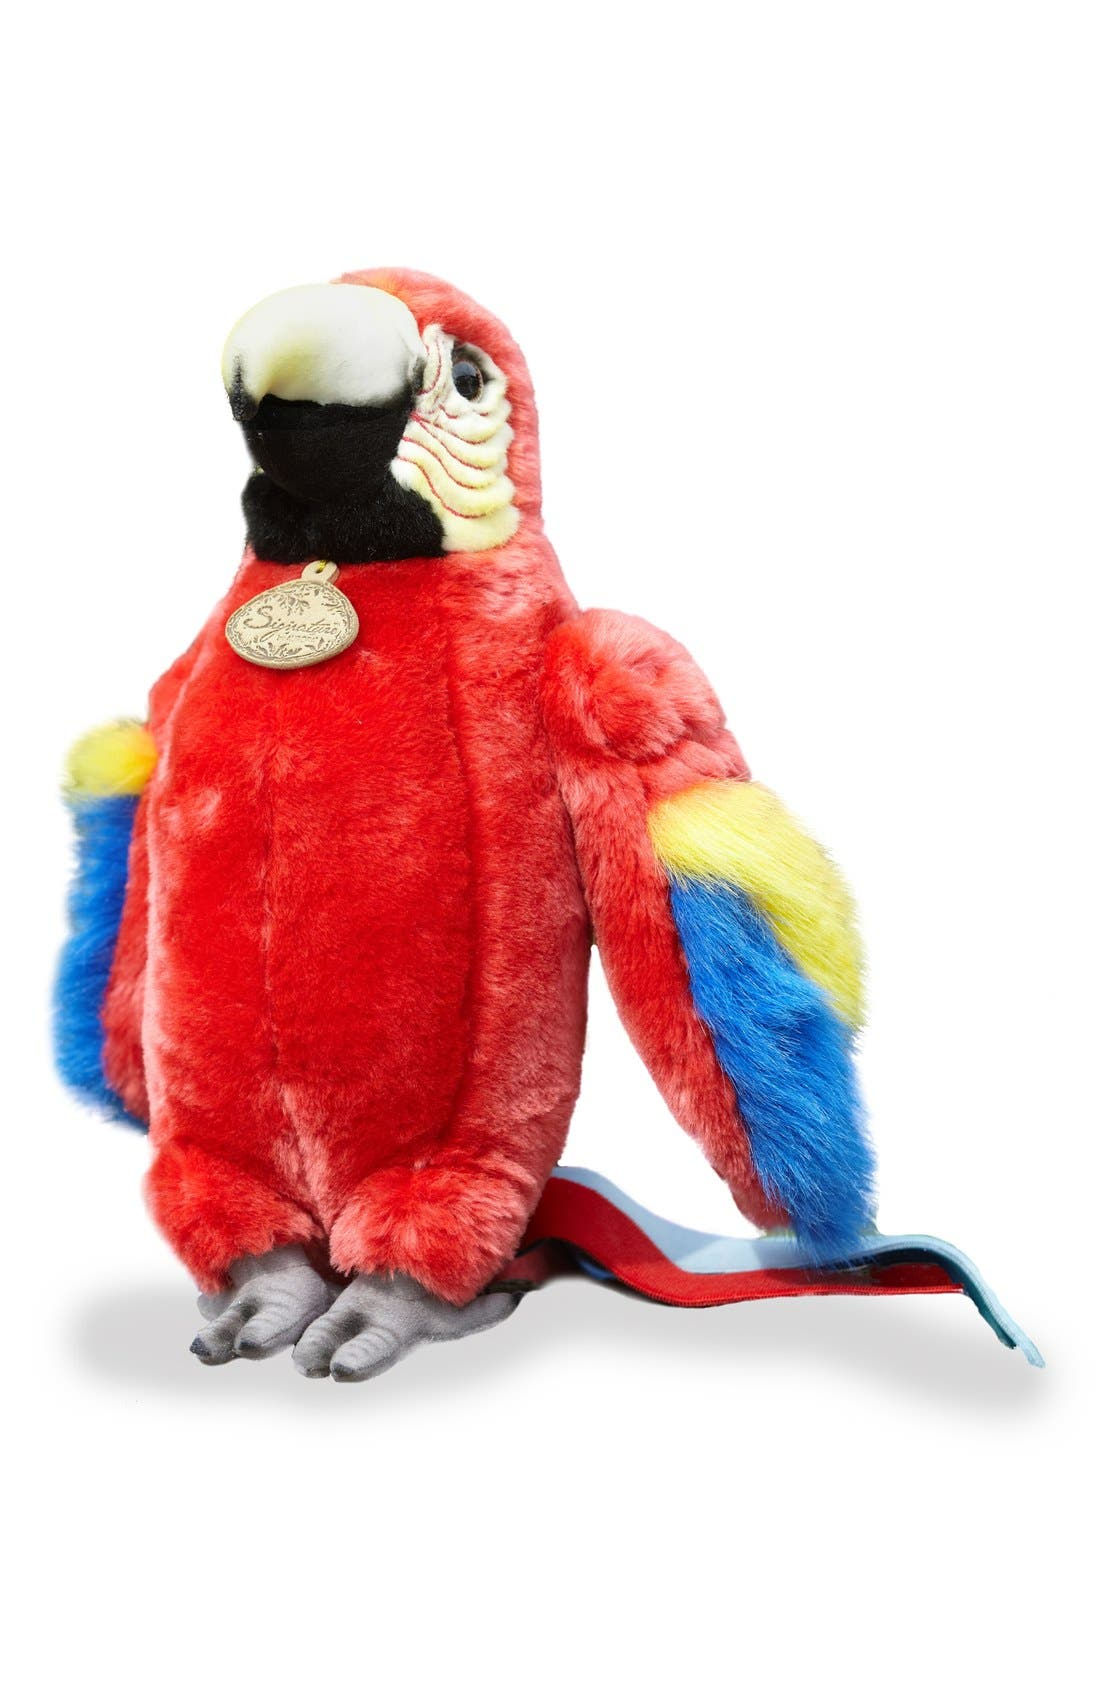 Alternate Image 1 Selected - Aurora World Toys 'Scarlet Macaw' Stuffed Animal